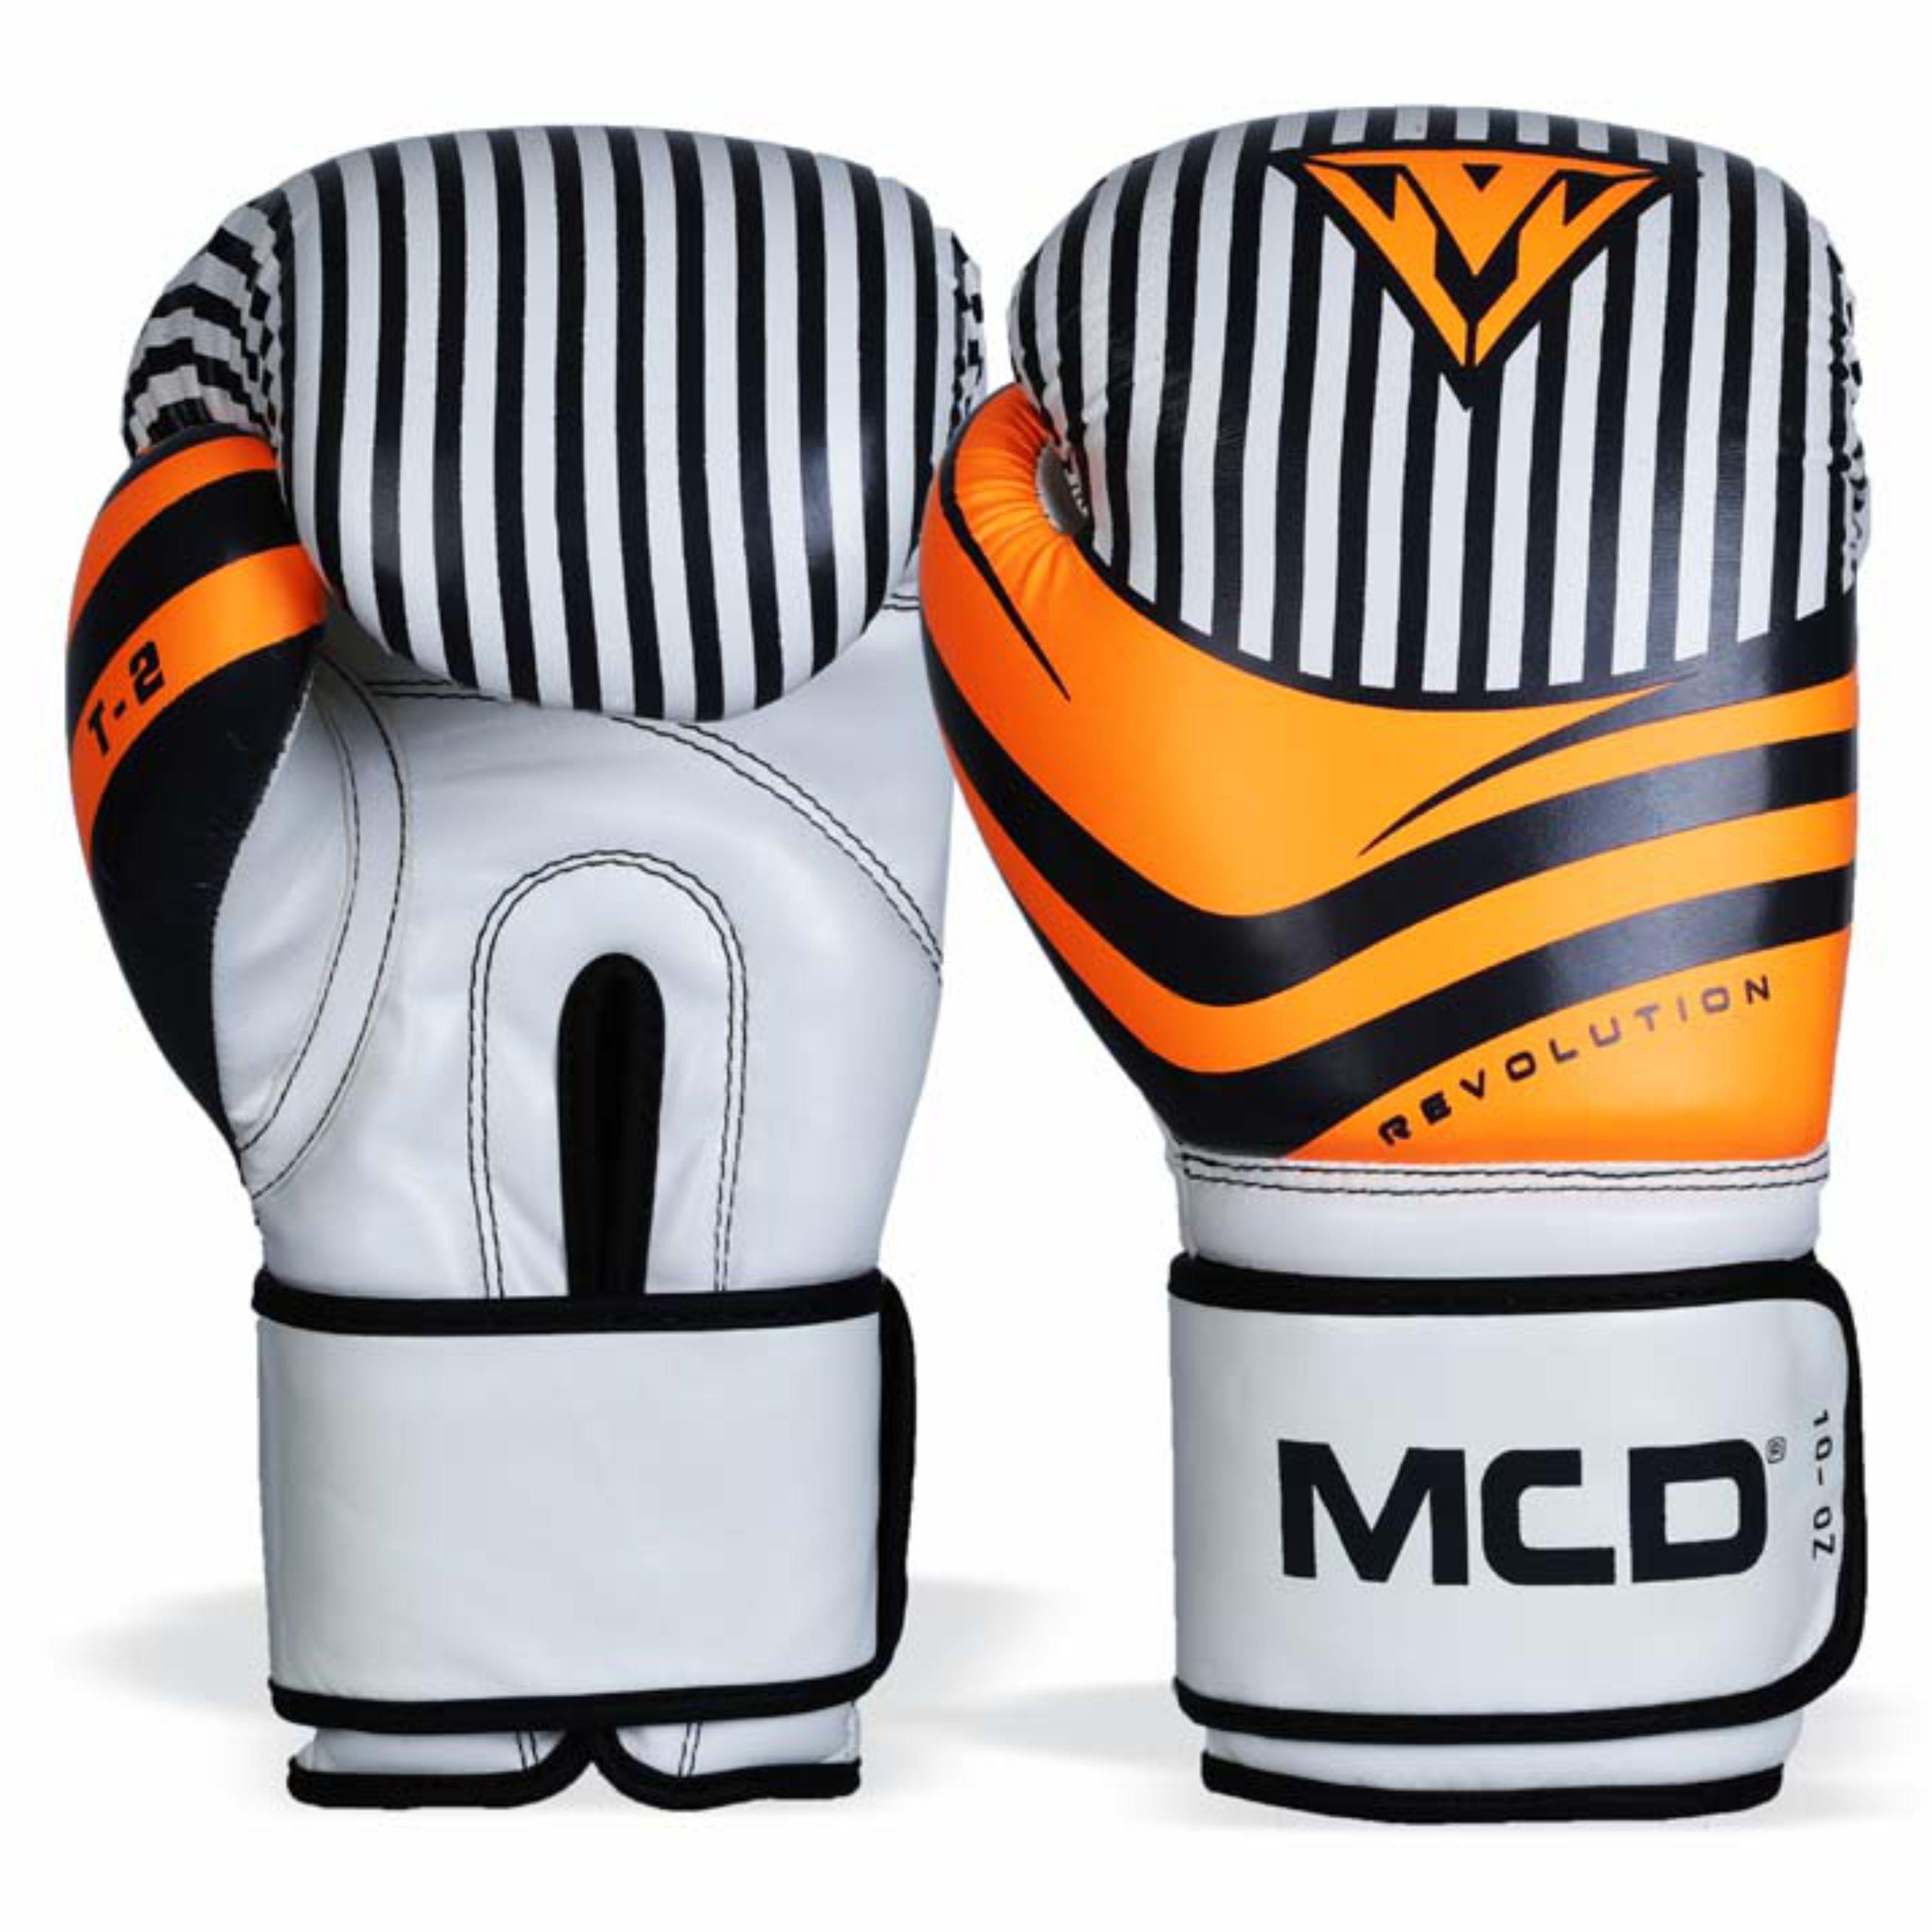 MCD Professional Gloves T-4 Blue/Red & R-5 Boxing Gloves & DR-7 Boxing Gloves, Best overall Boxing Gloves, Most durable Bag Gloves, Best power Punch Bag Gloves for Punching, Most secure Sparring Gloves, Best value Professional Gloves